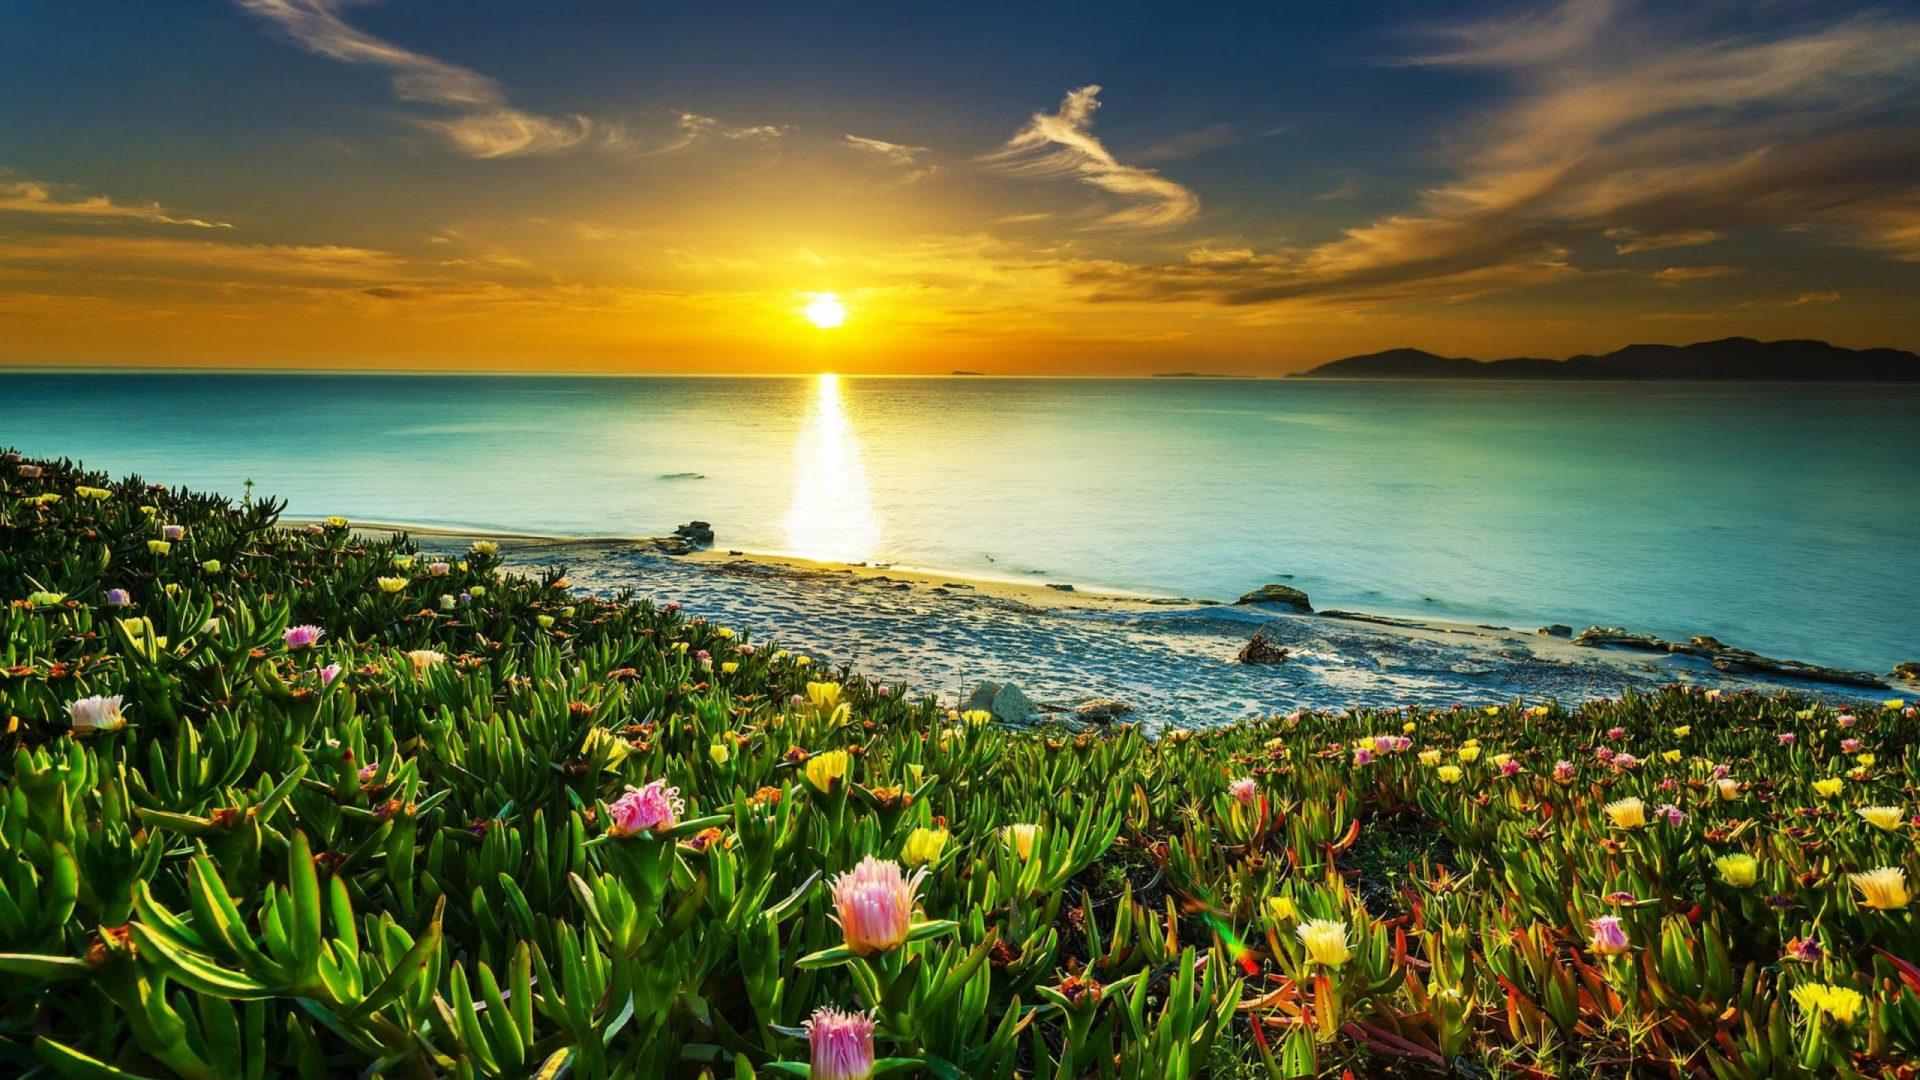 World Beautiful Cars Wallpapers Sea Coast Meadow With Tropical Flowers Sandy Beach Calm